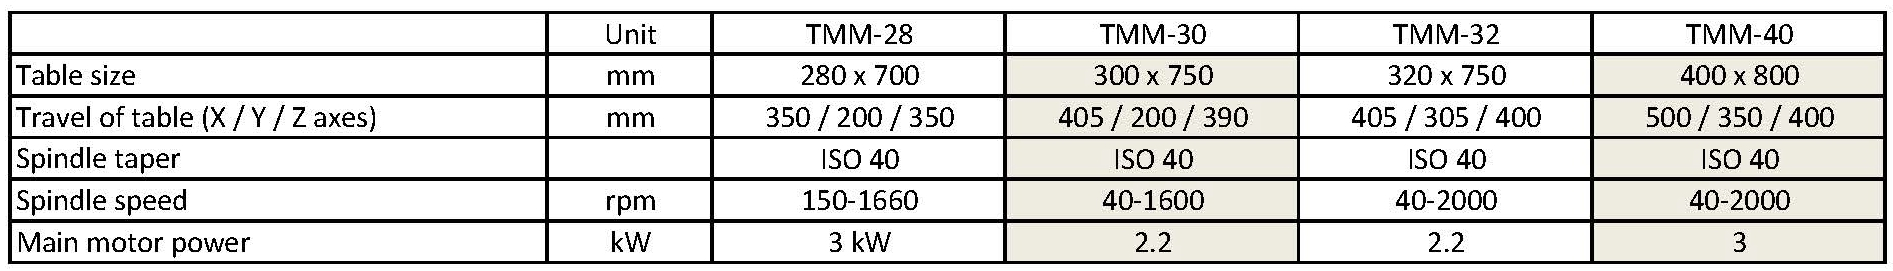 技术参数 - TMM